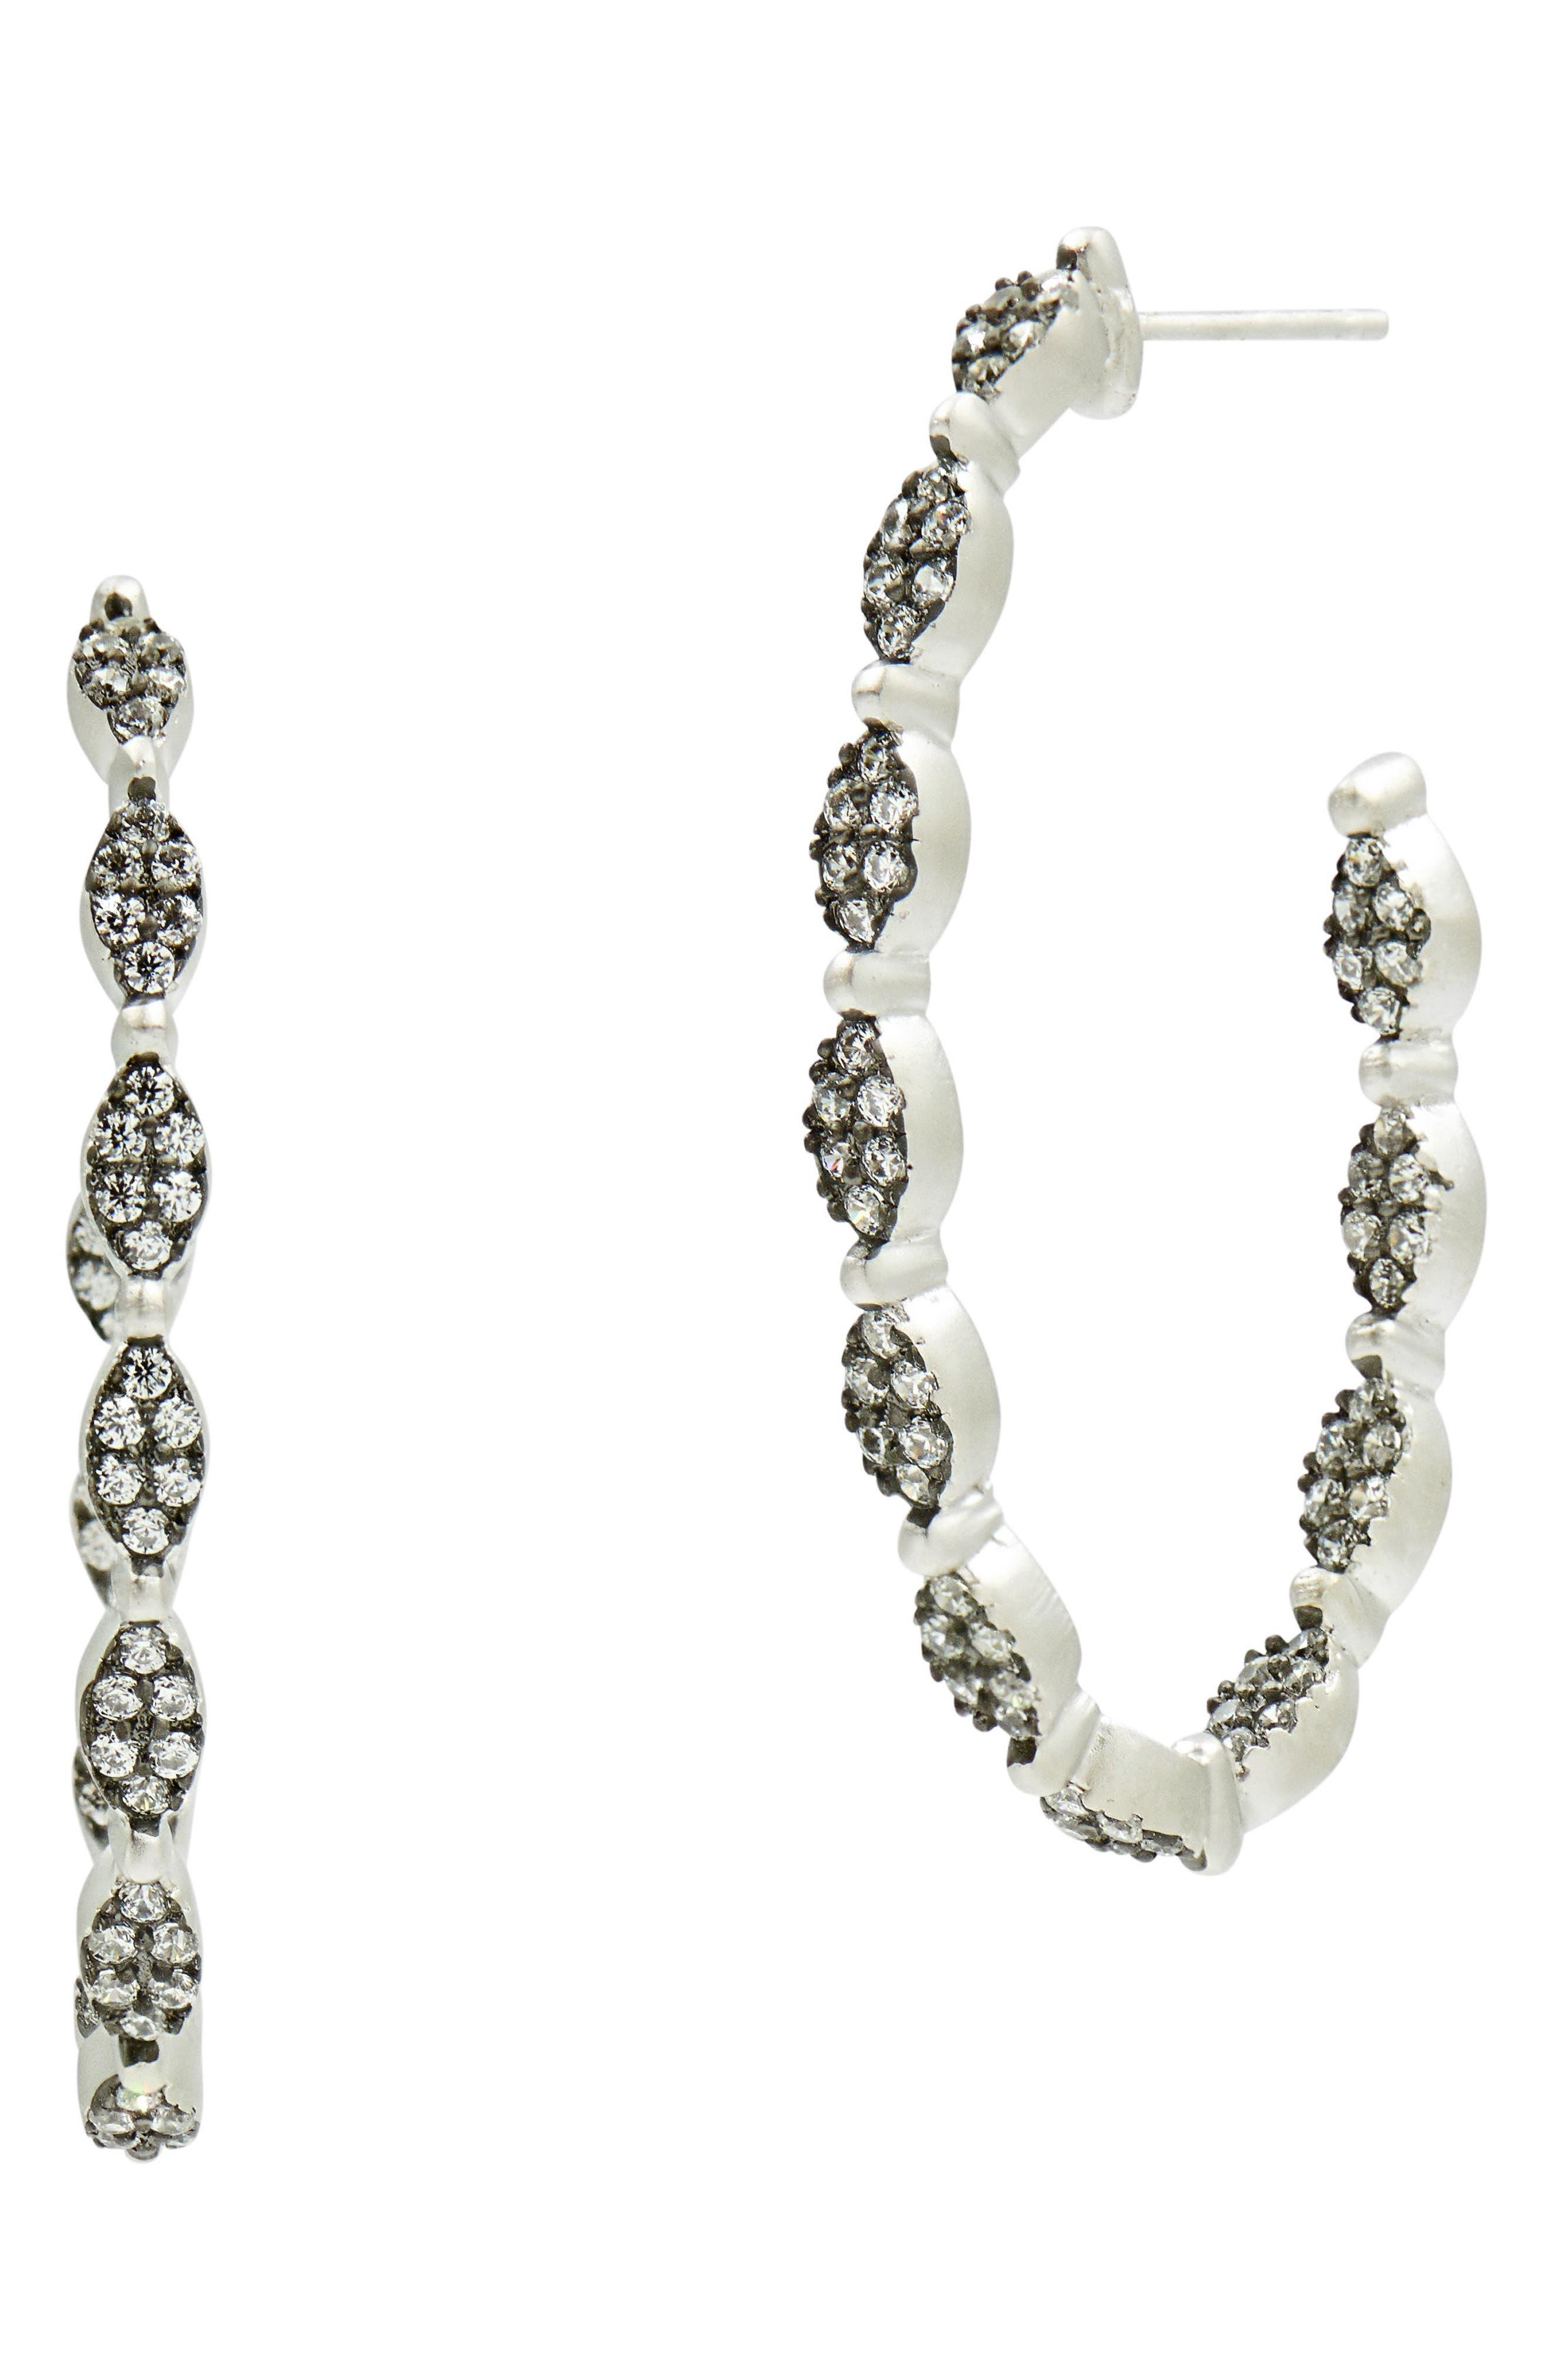 Industrial Finish Pavé Hoop Earrings,                         Main,                         color, Black/ Silver